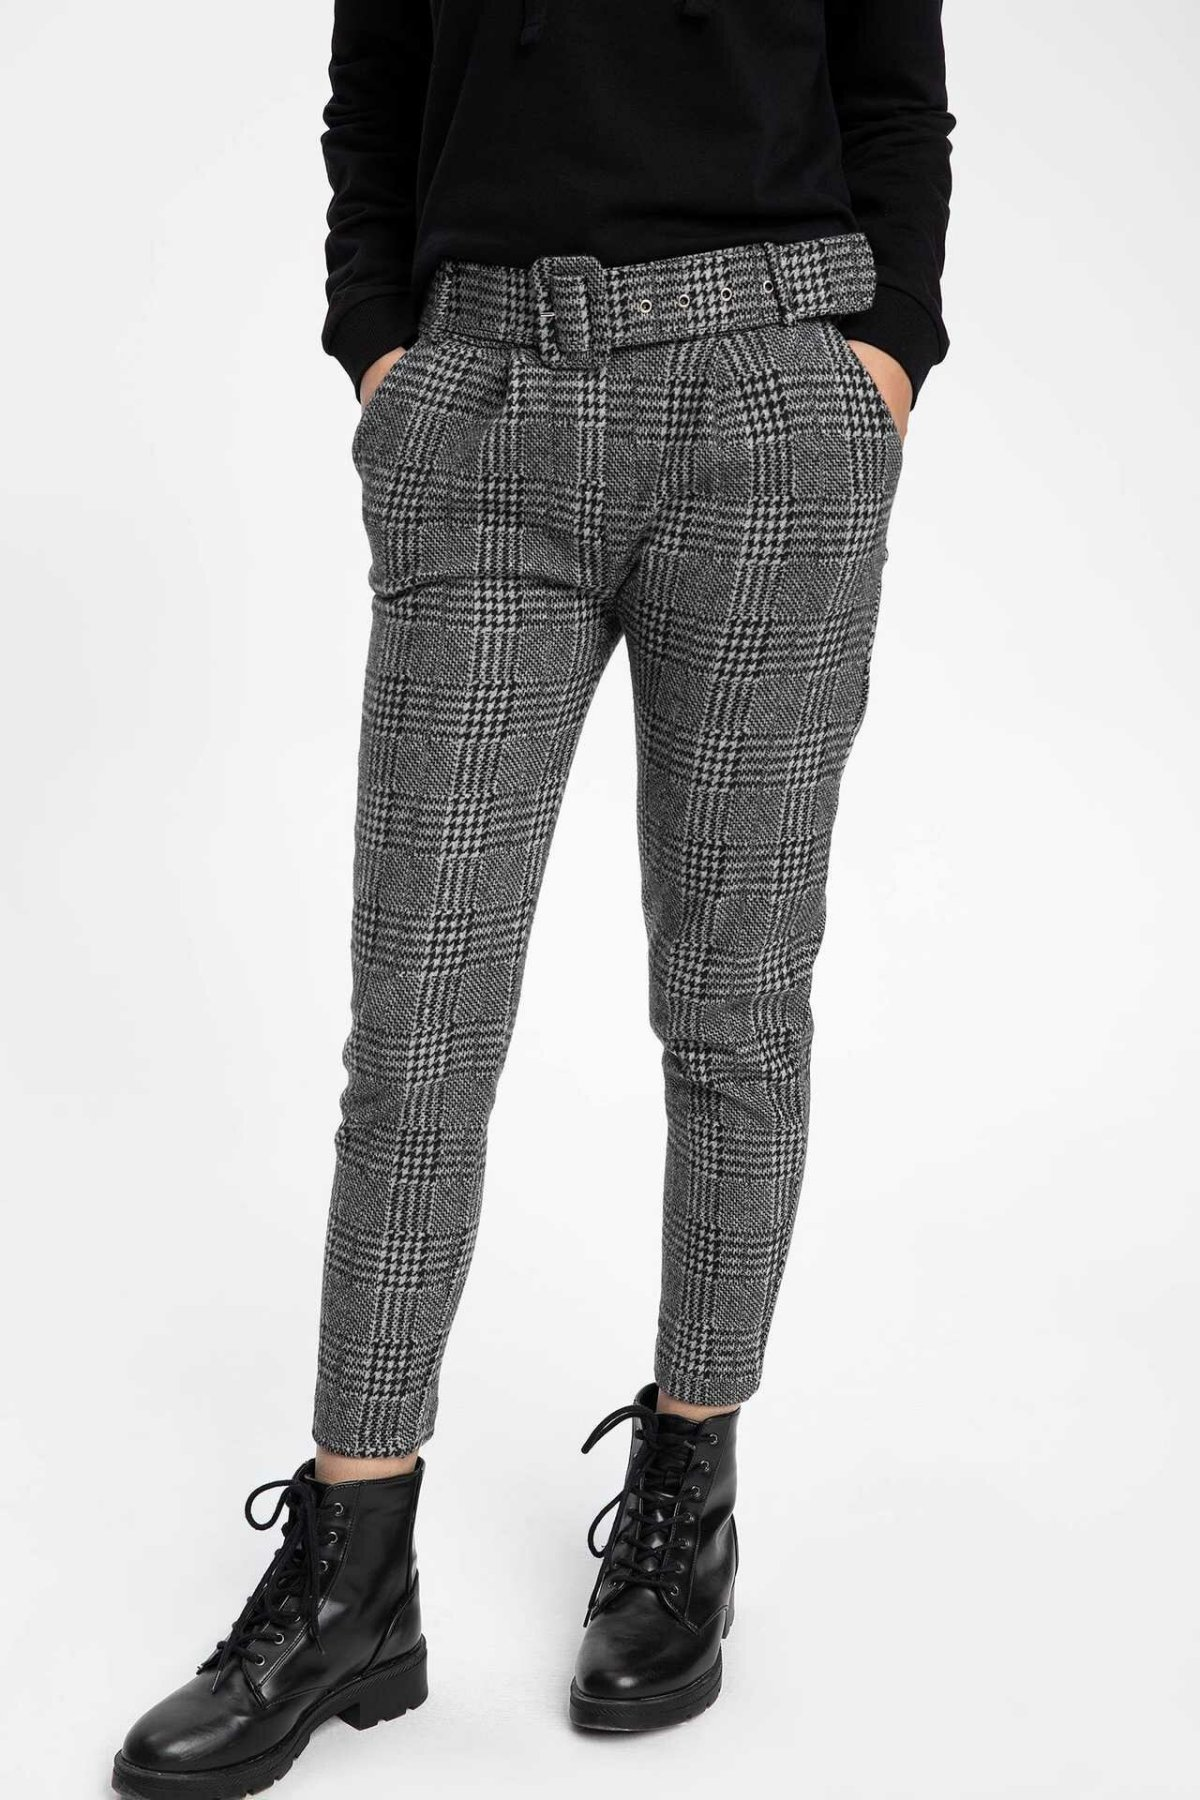 DeFacto Woman Autumn Stylish Grid Long Pants Women Pencil Pant Casual Fashion Female Bottoms Trousers-K6890AZ18WN